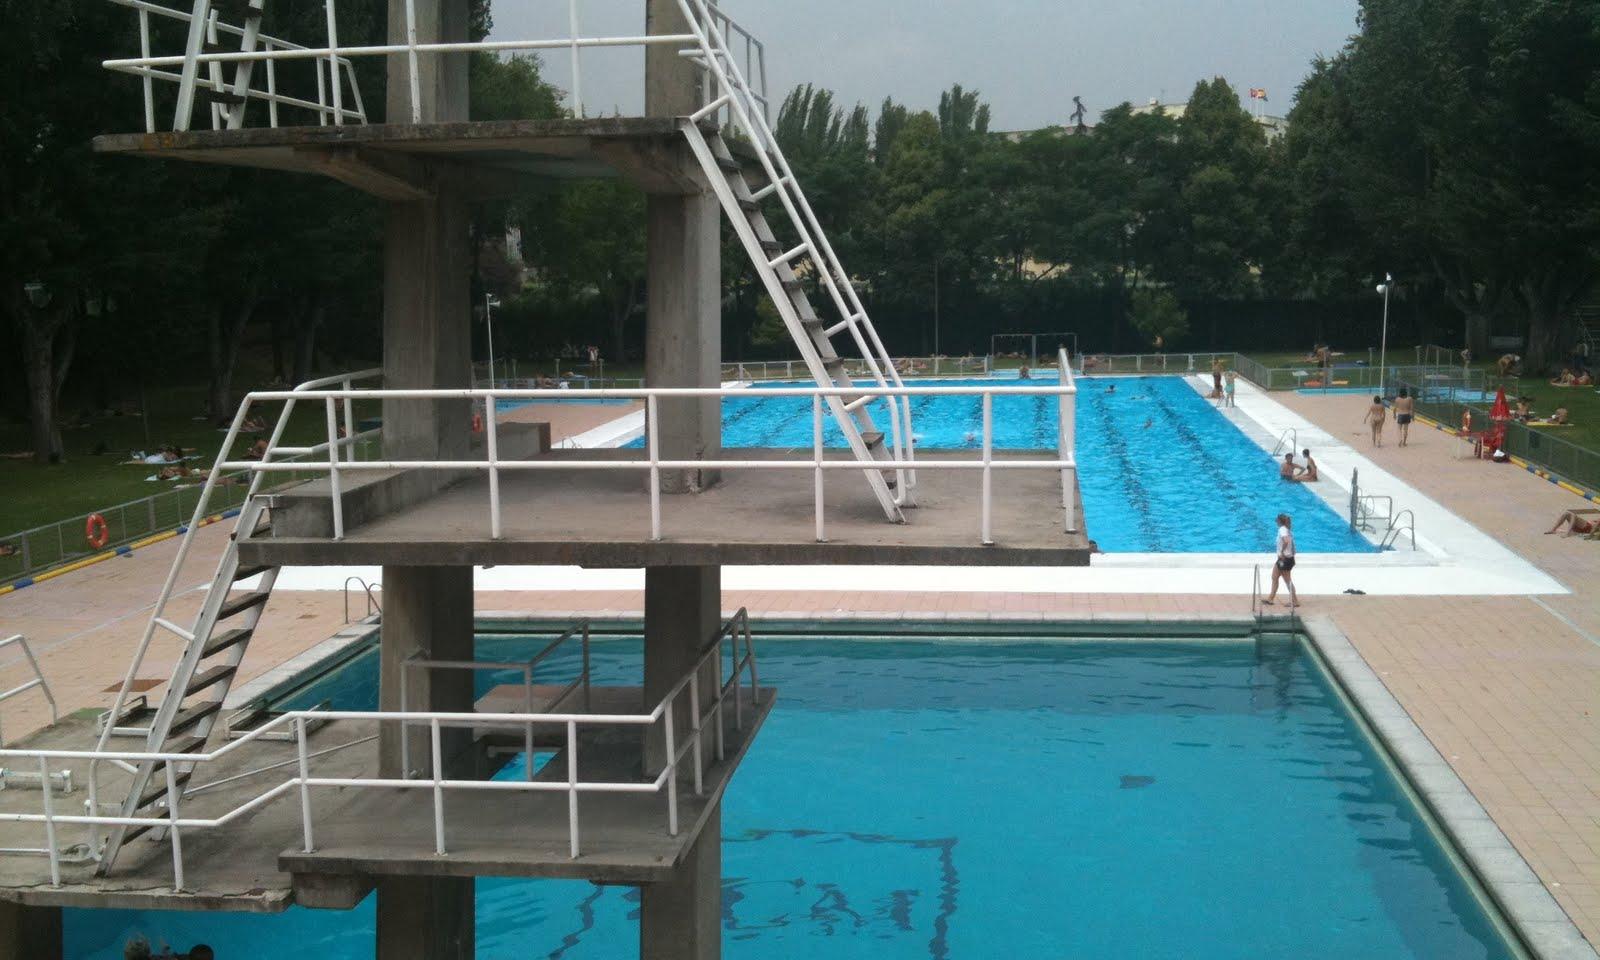 La piscina de la complu el watergate de mariano for Piscina complutense madrid